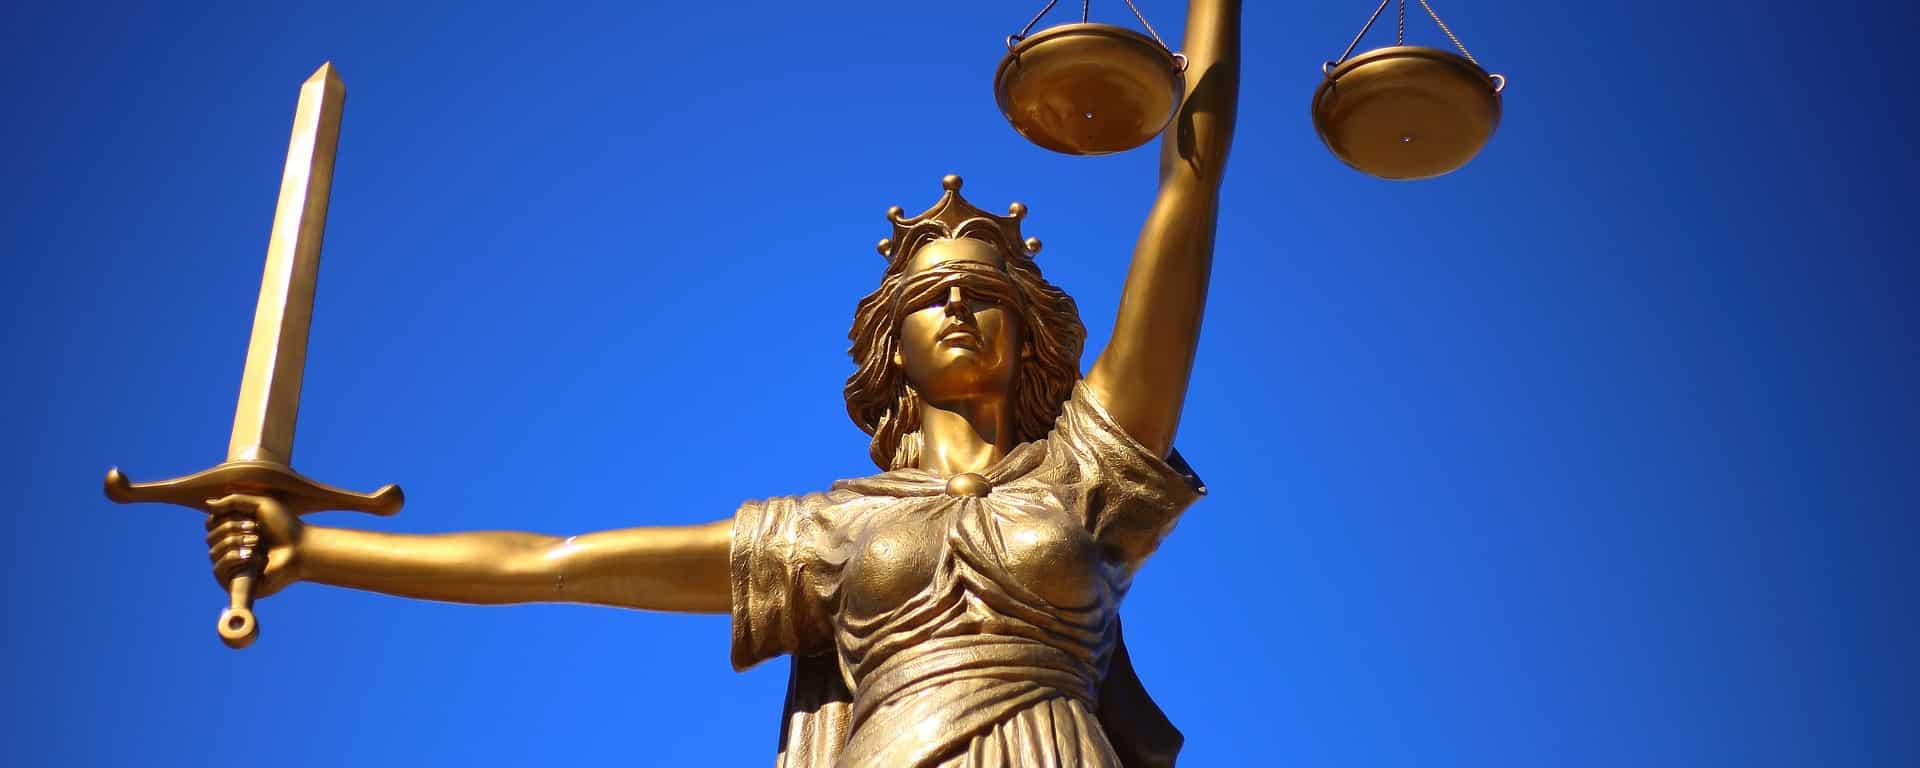 Tendências Jurídicas para 2019